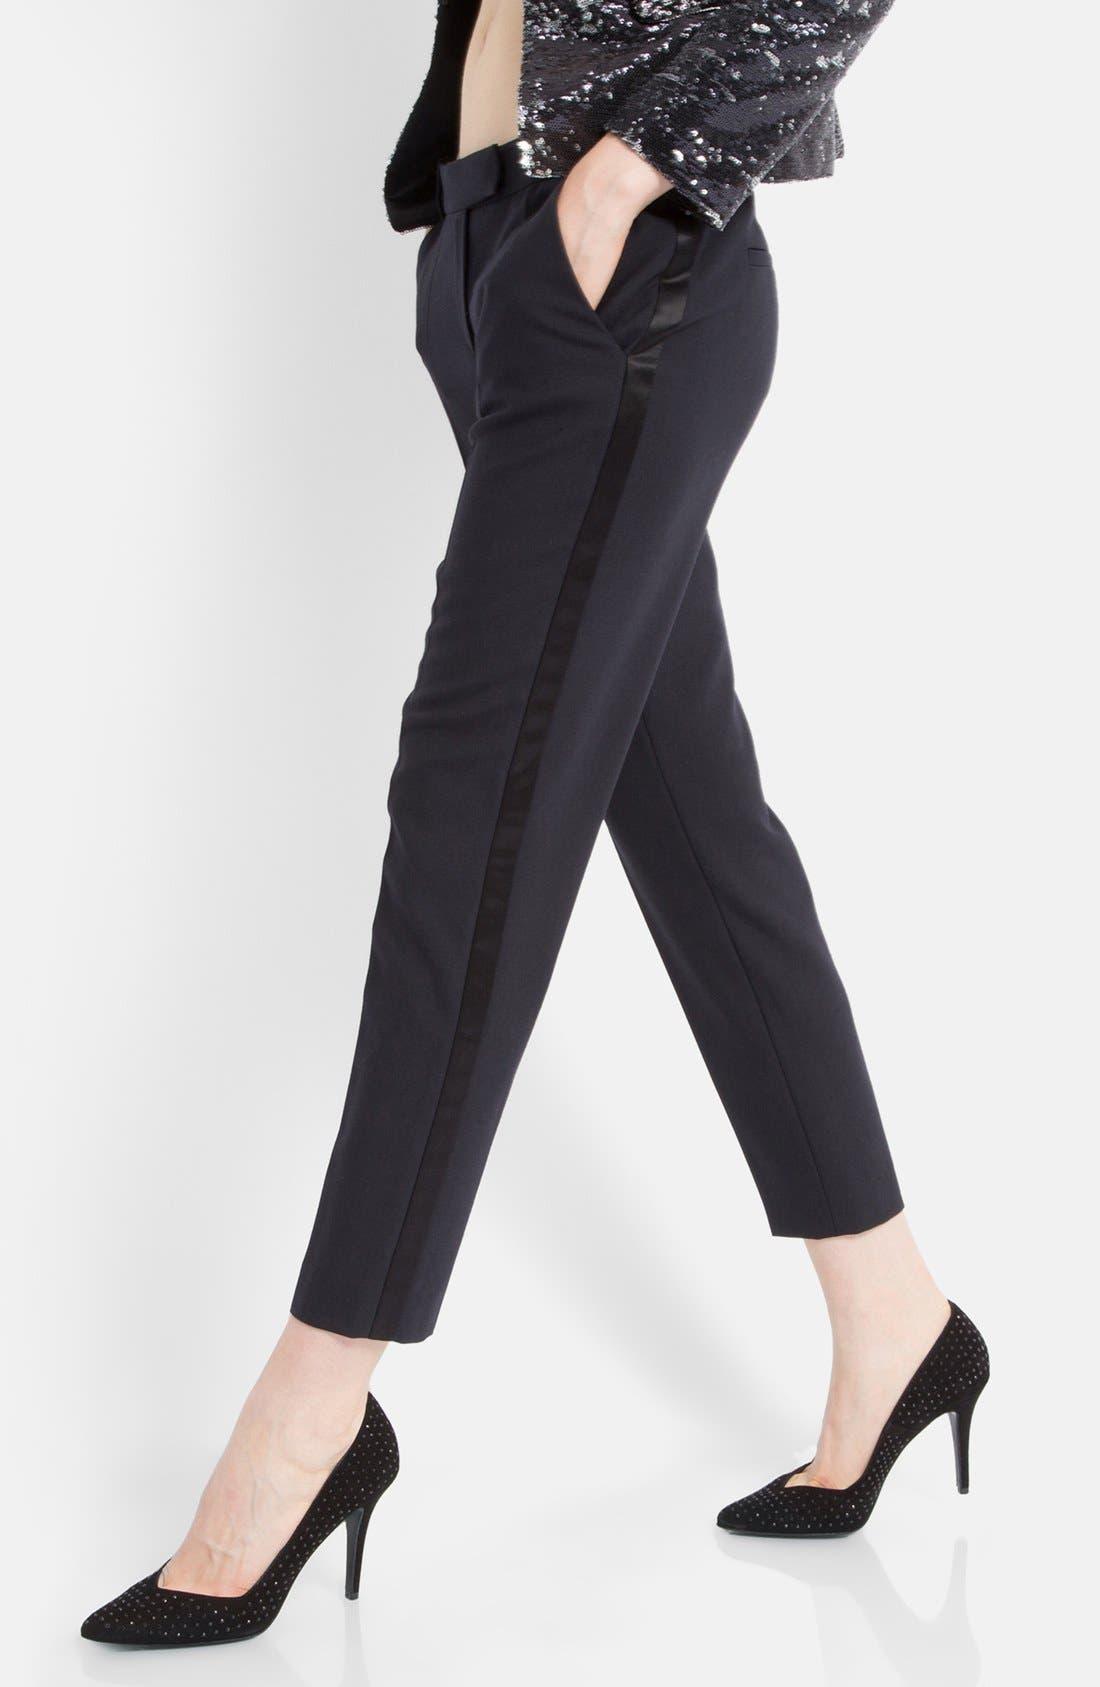 Main Image - maje 'Erika' Tuxedo Stripe Pants